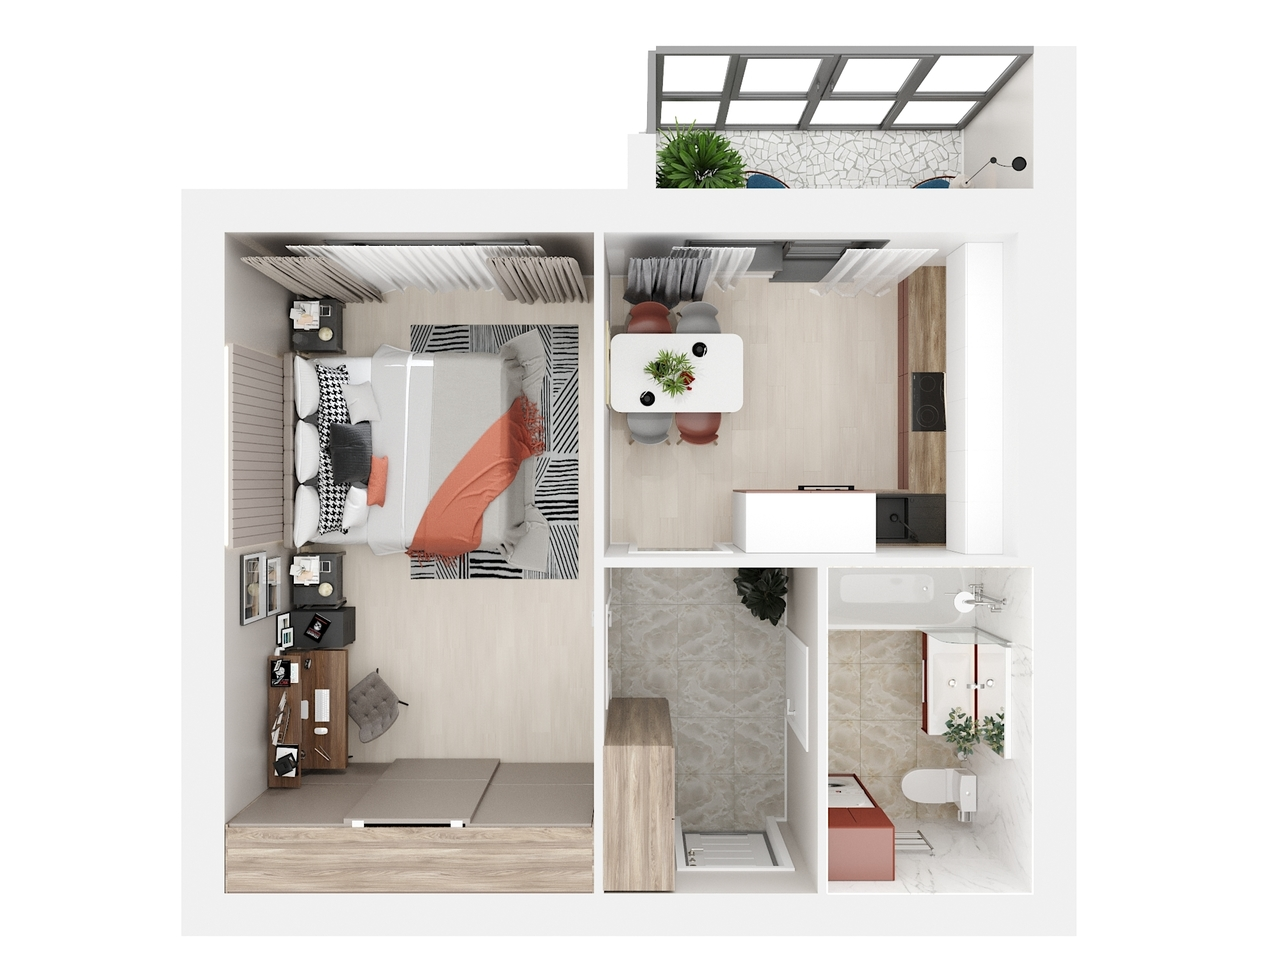 Дом 3 - 1-комнатная №27